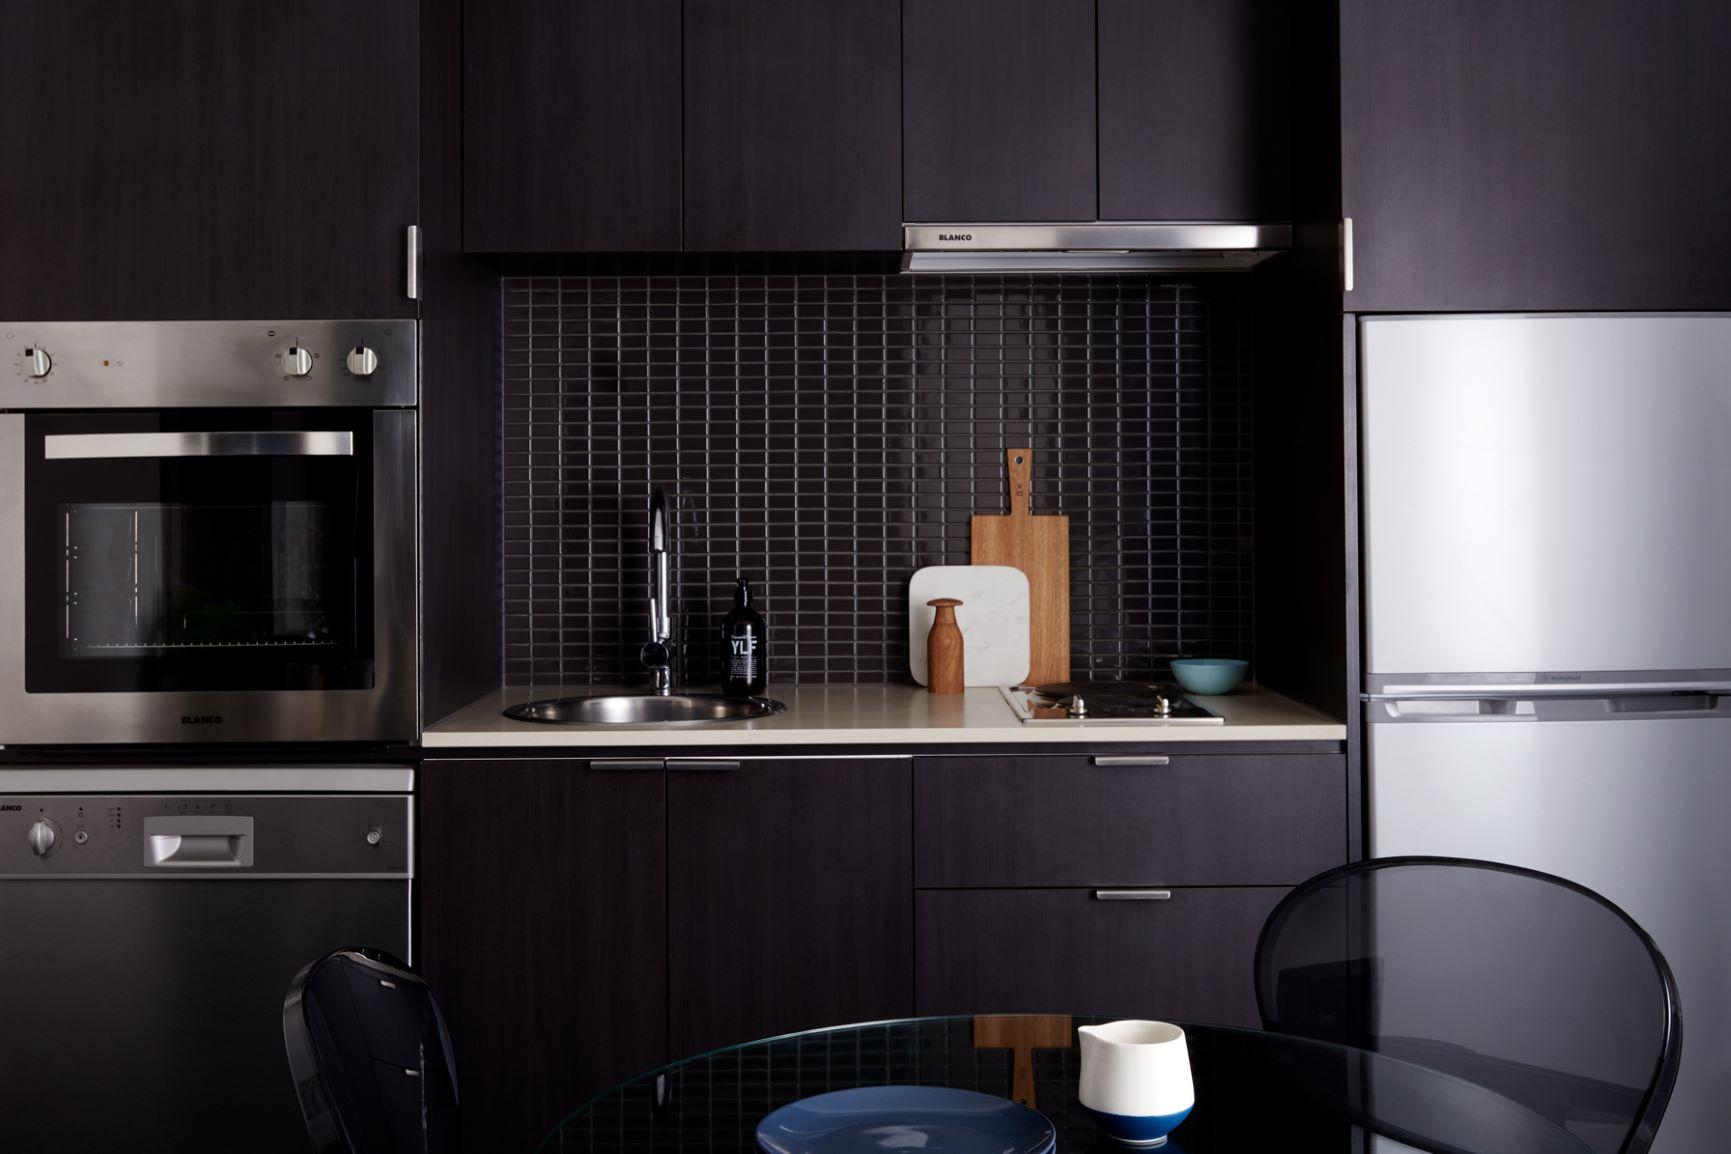 Kitchen at South Yarra Grand Apartments